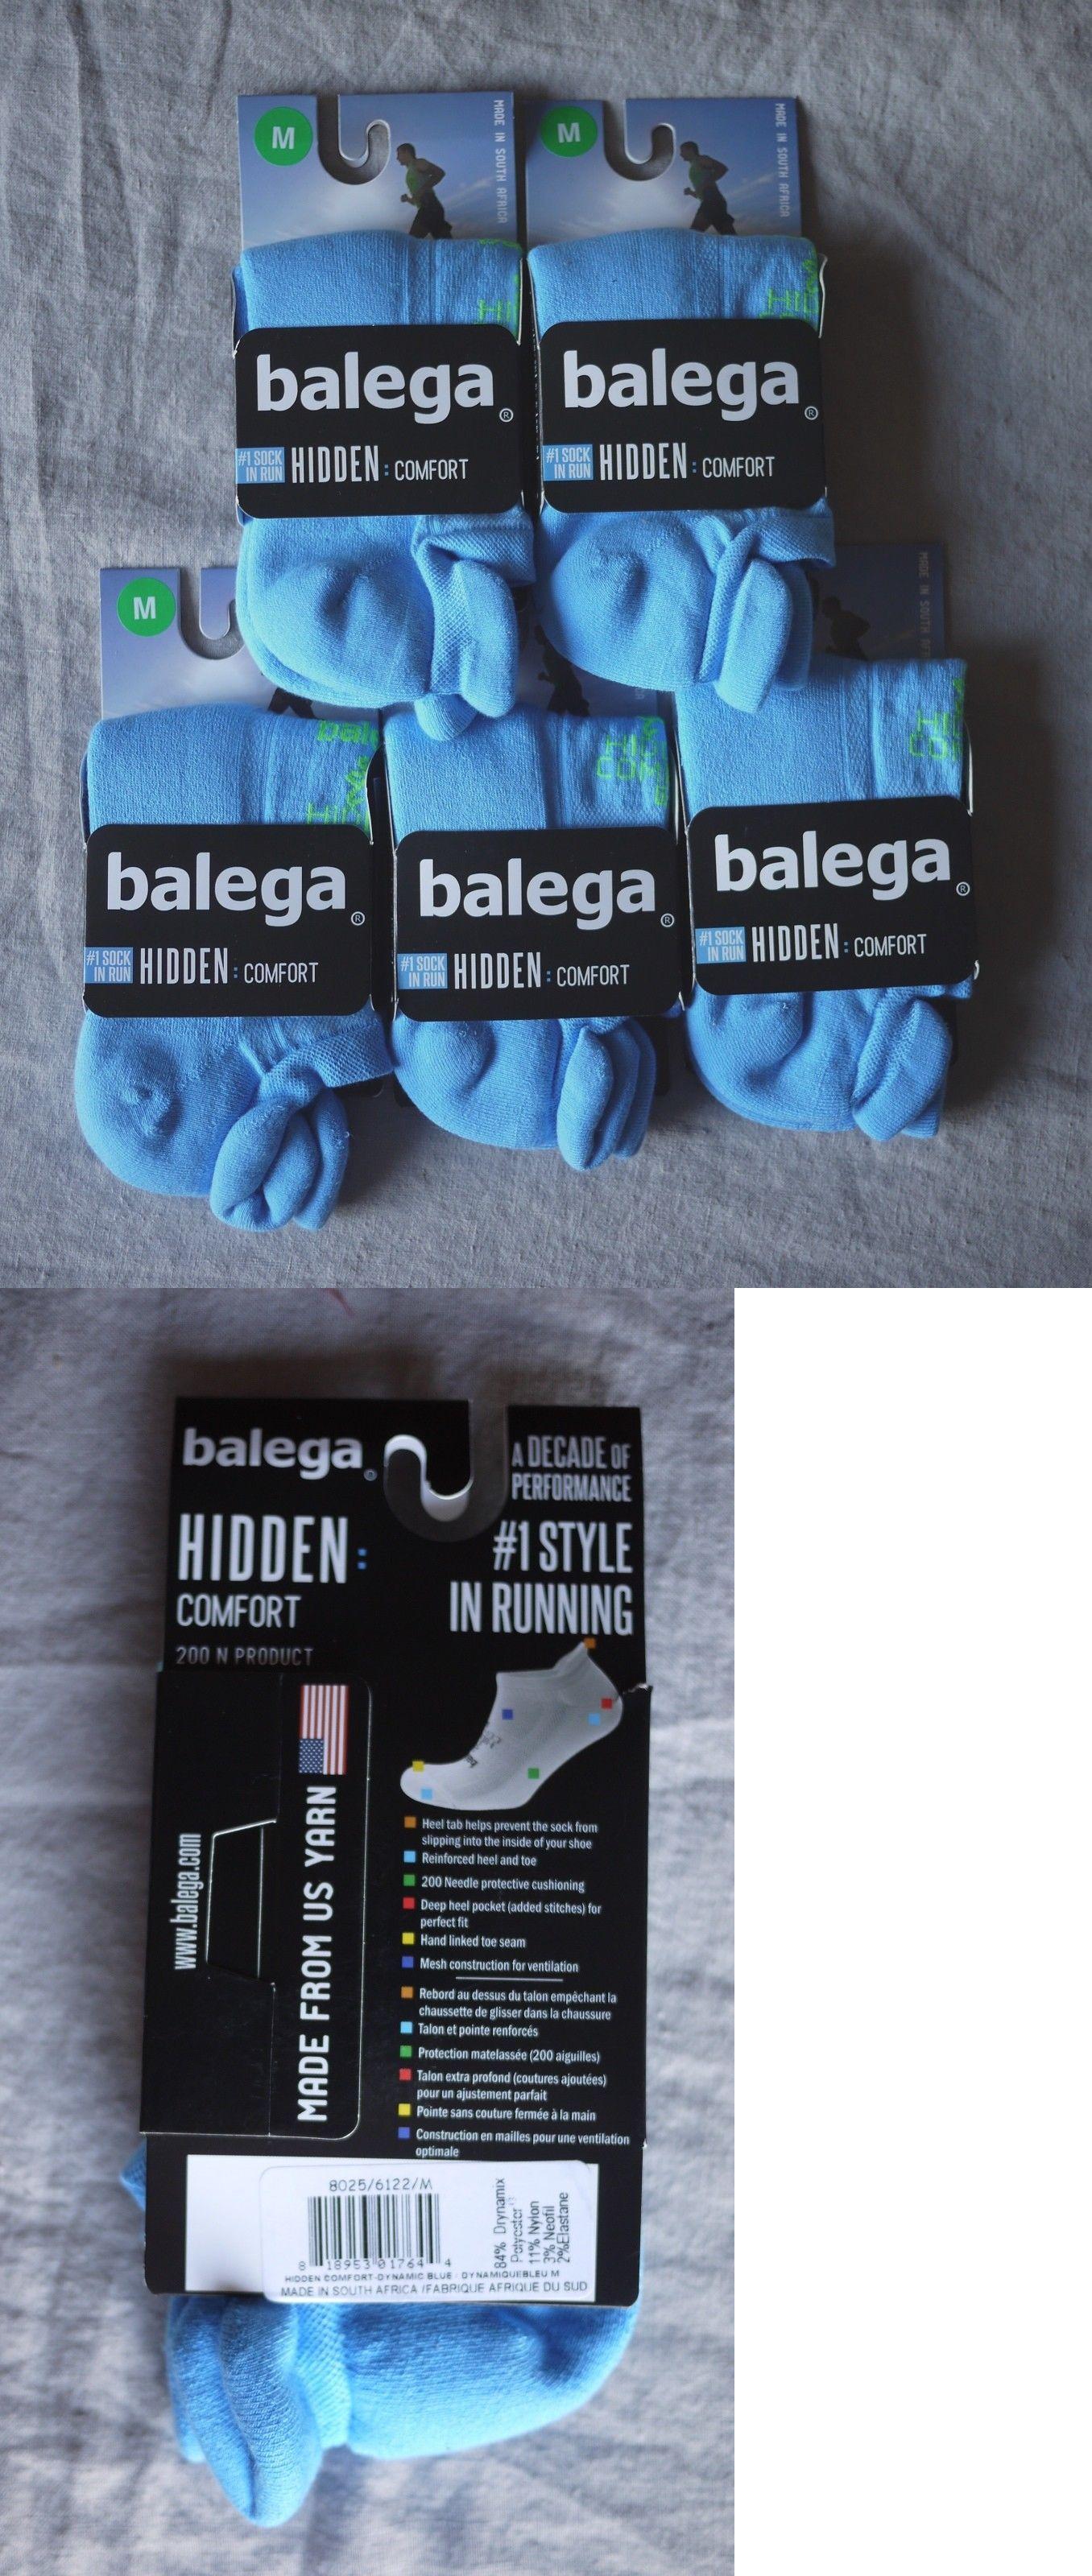 nordstrom men ankle s hidden balega comfort height c socks comforter